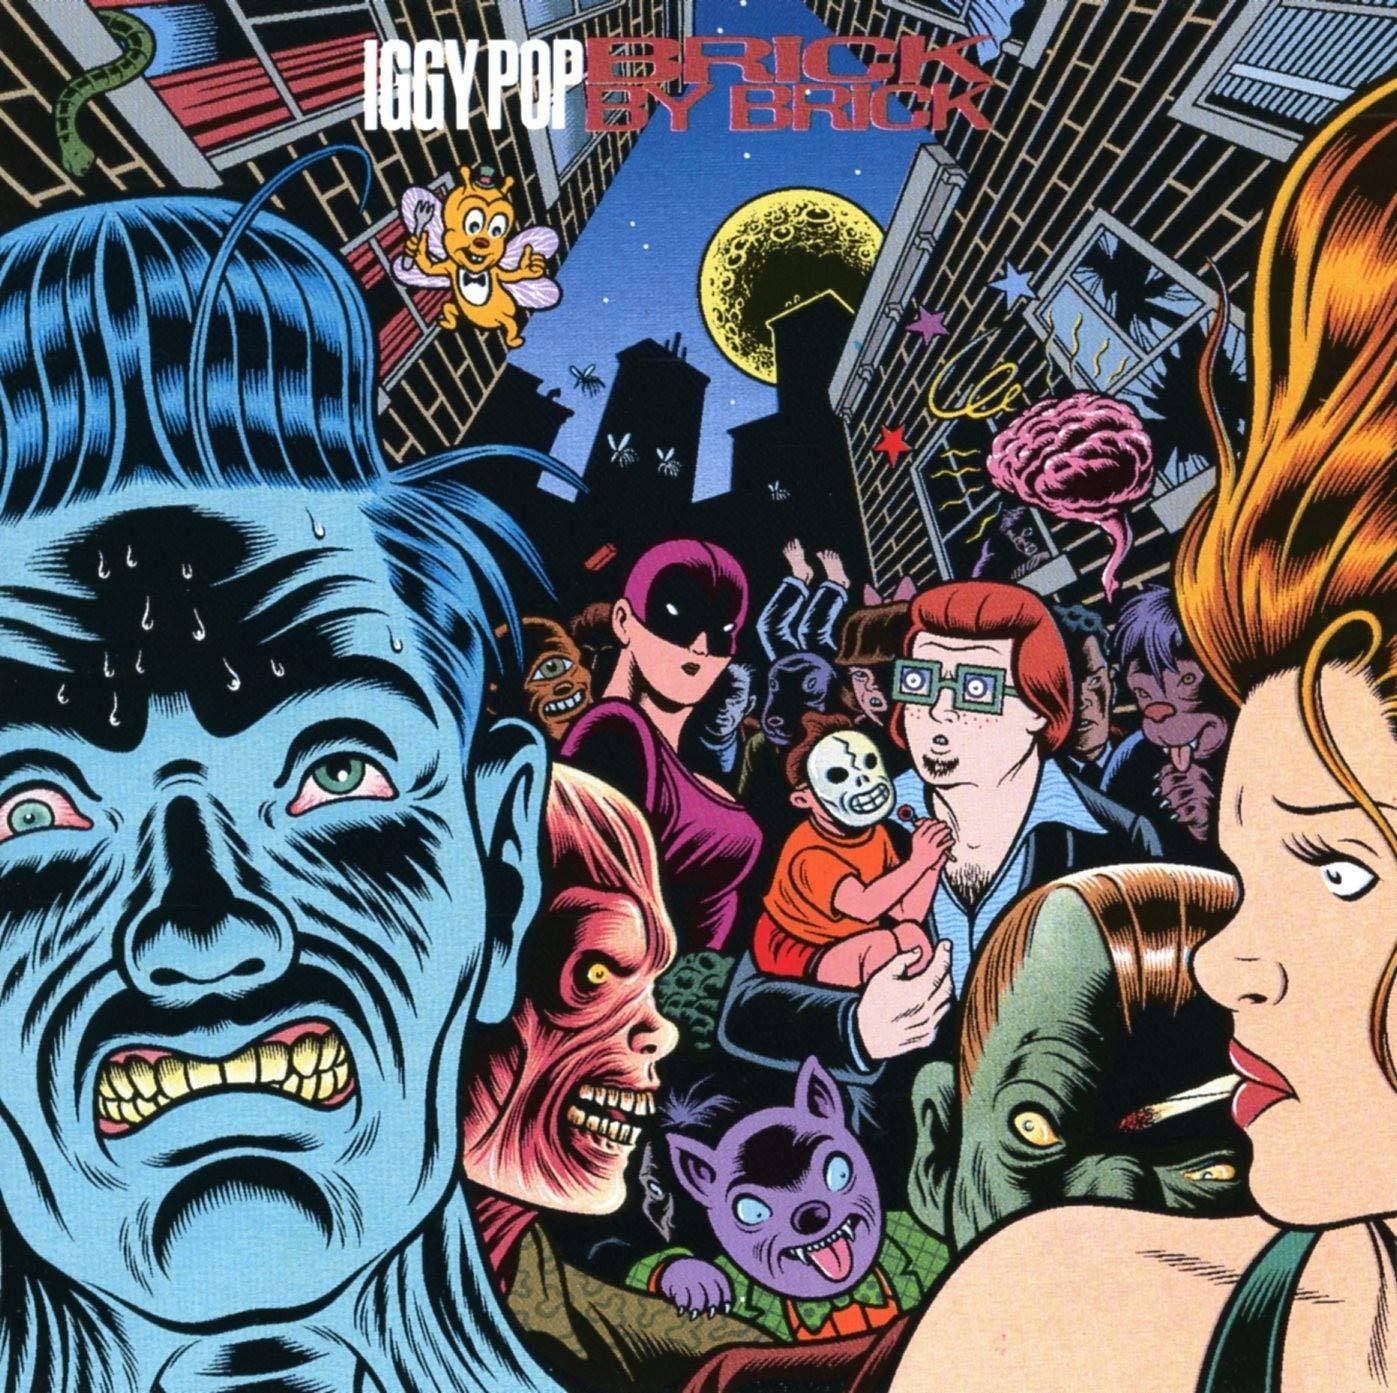 Como surgiu a capa de Brick By BricK, de Iggy Pop